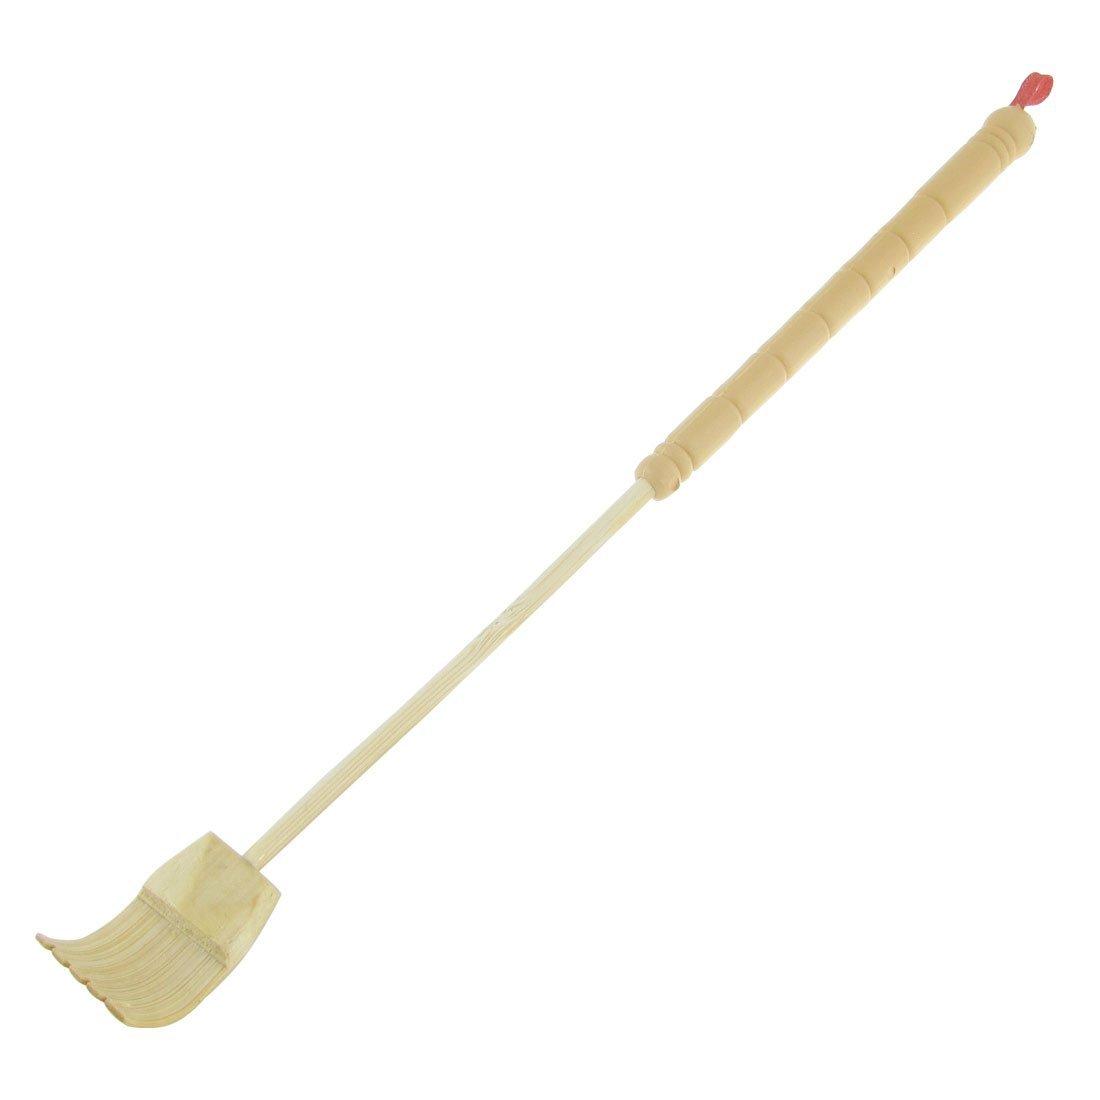 2x poignee en plastique bambou telescopique flexible de for Bambou plastique